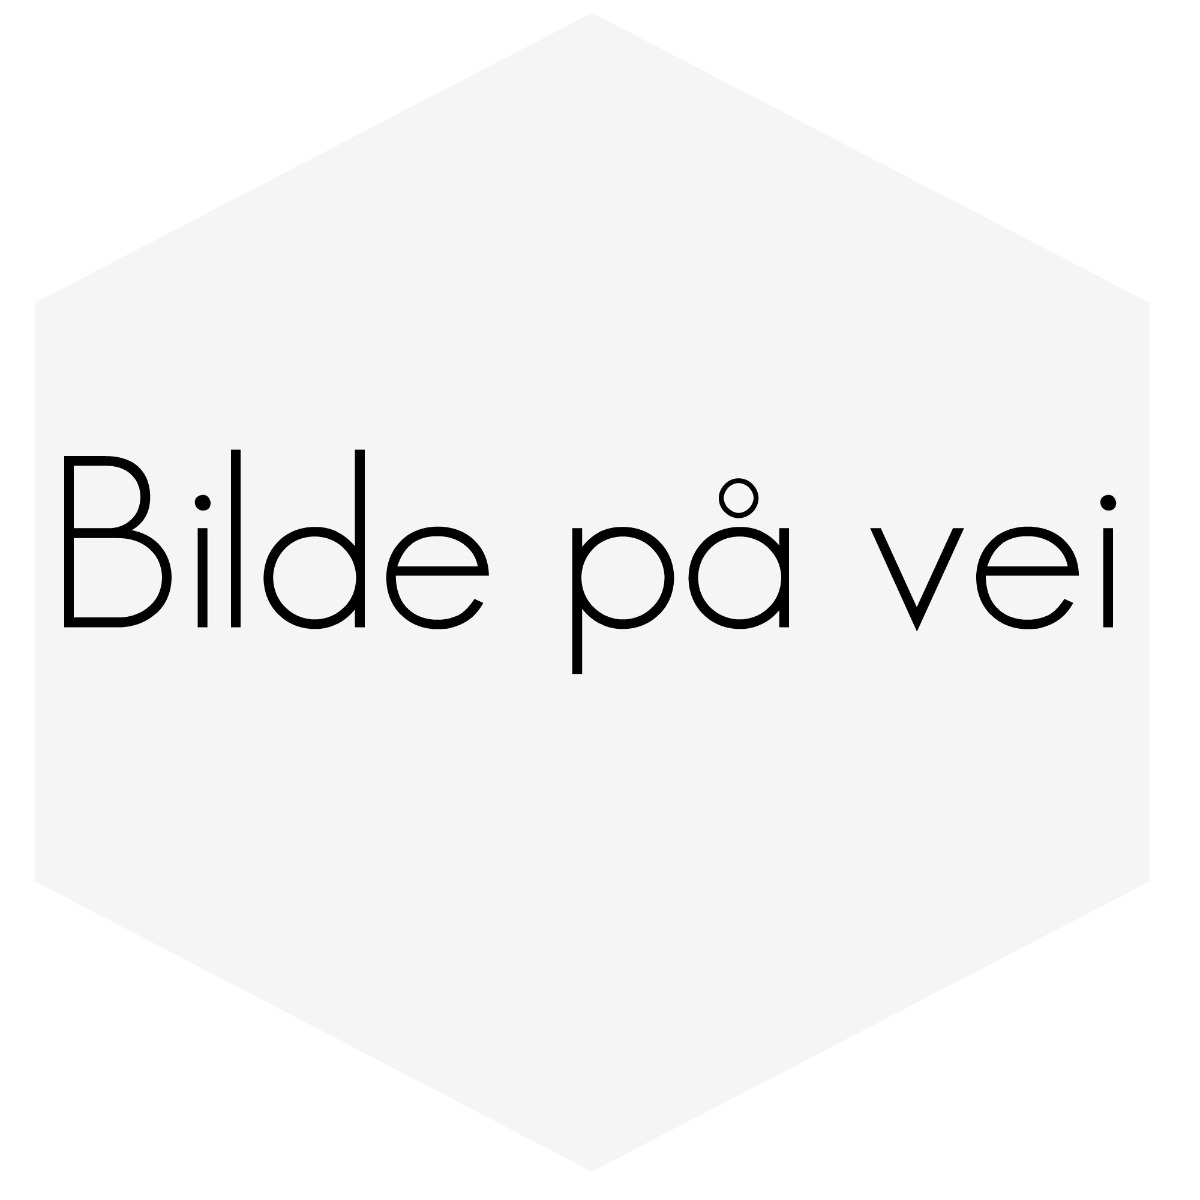 SPYLERPUMPE FRONTVINDU HØYTRYKK S60/V70 30699674-30649800